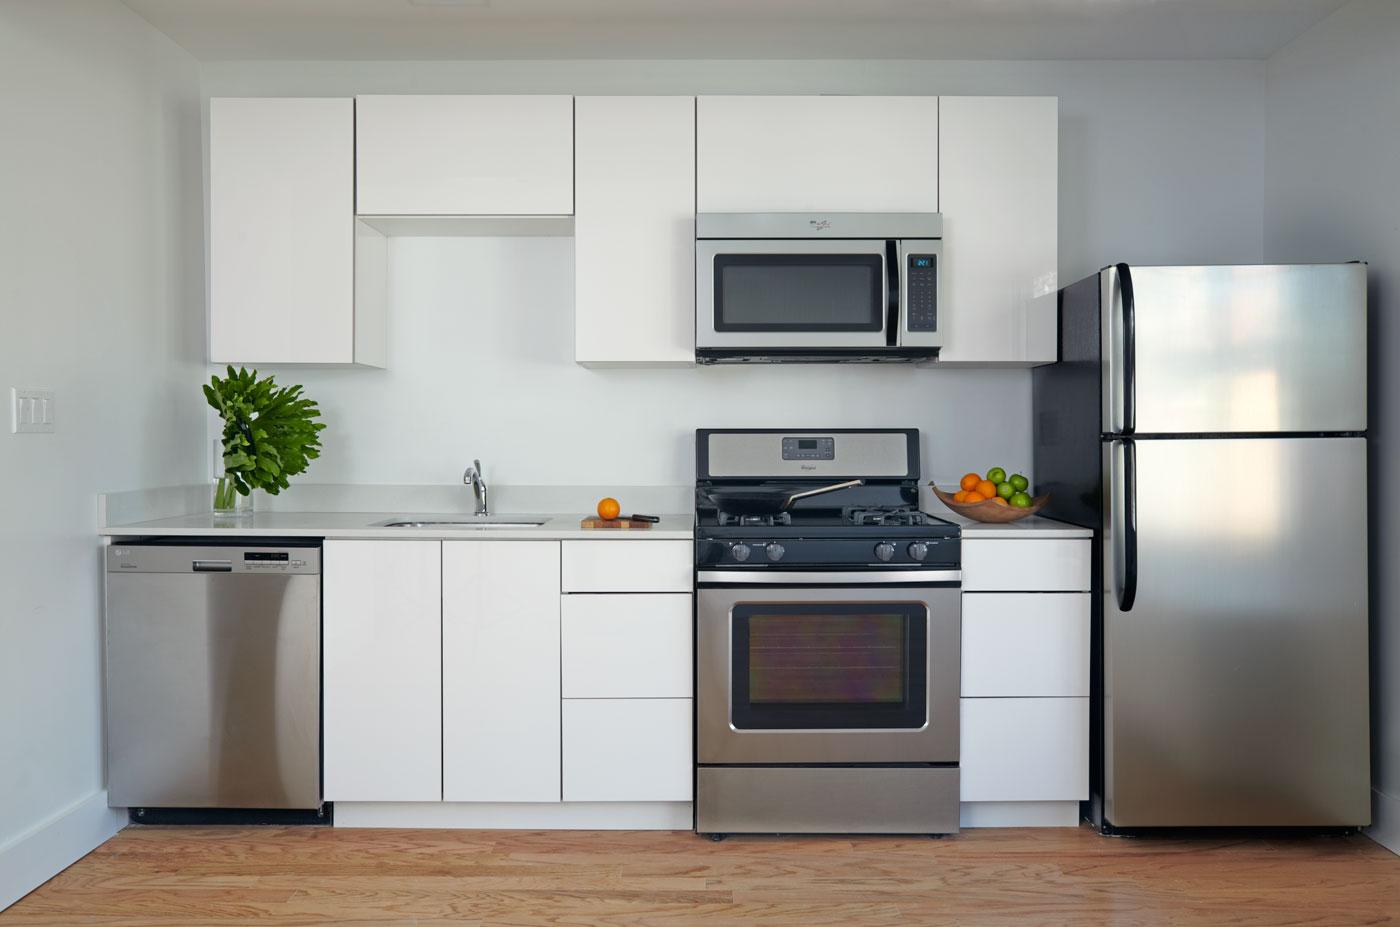 2270FDB - Apartments